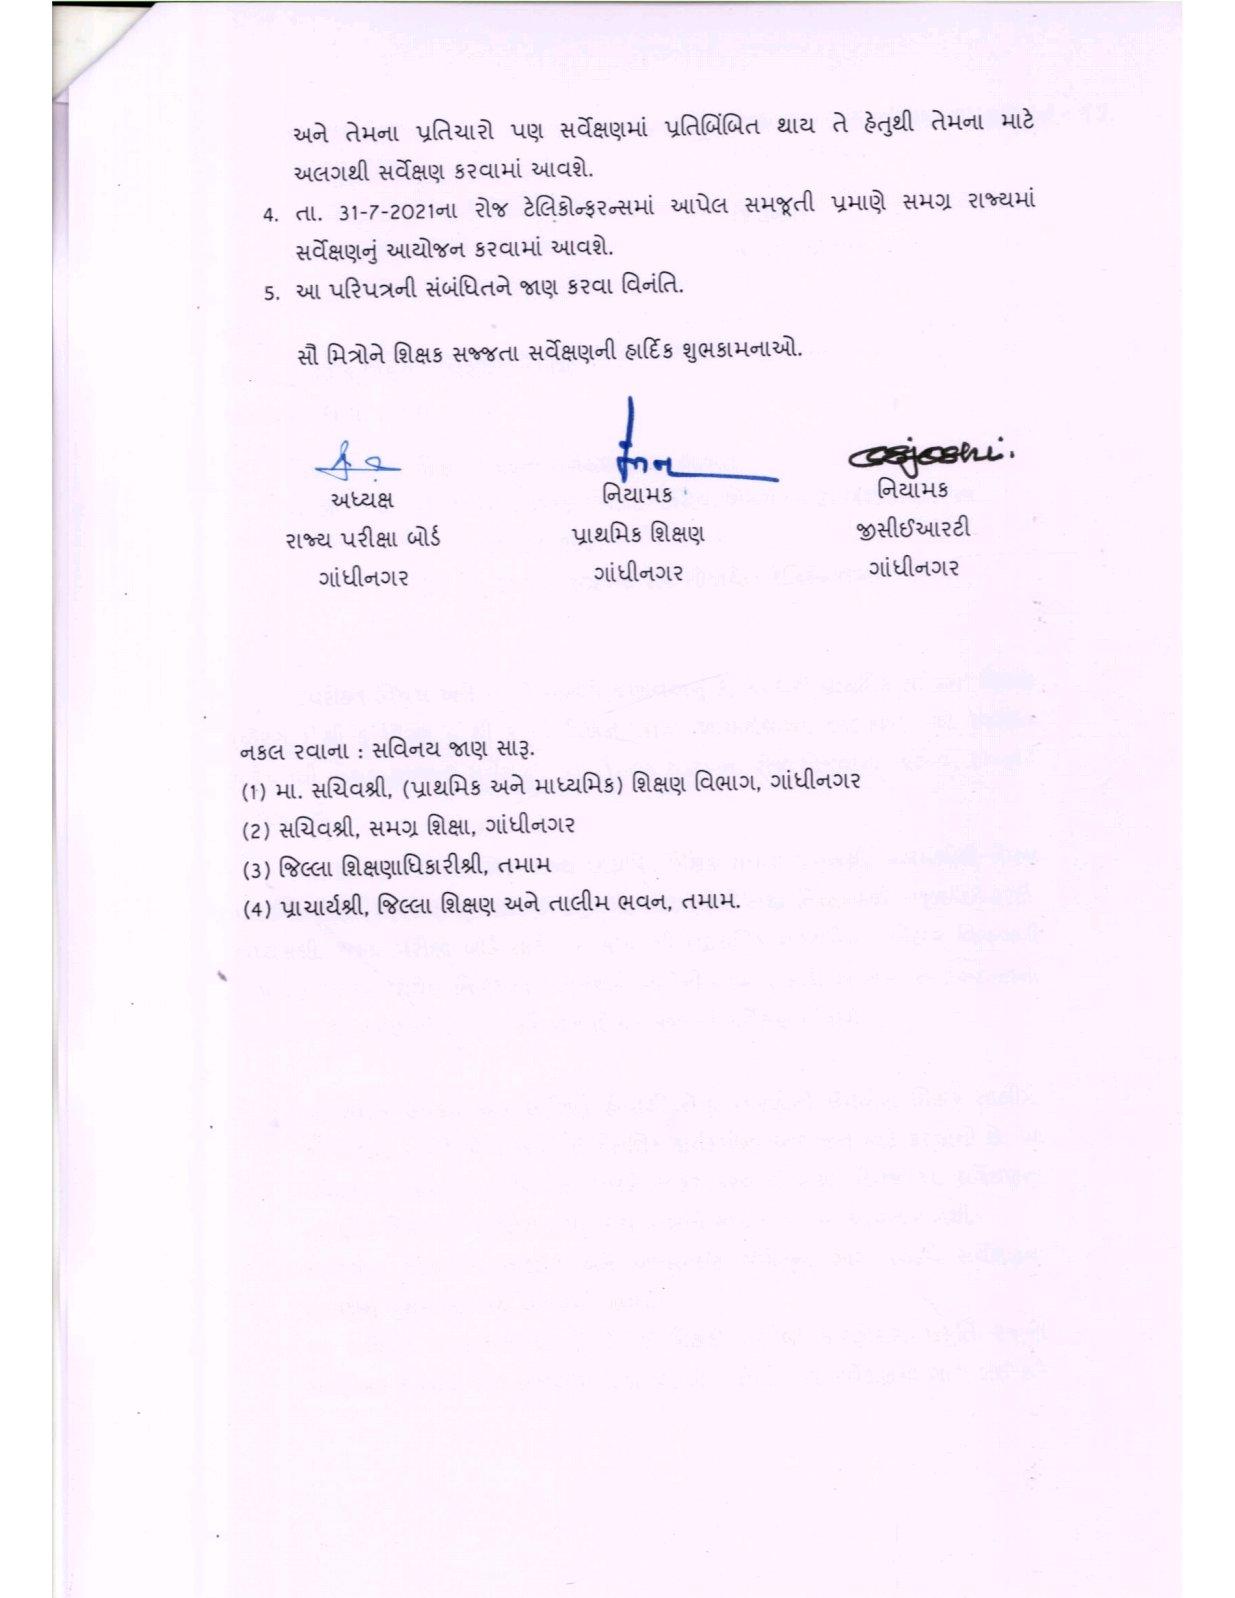 https://project303.blogspot.com/2021/07/shixak-sajjata-sarvexan-paripatra.html